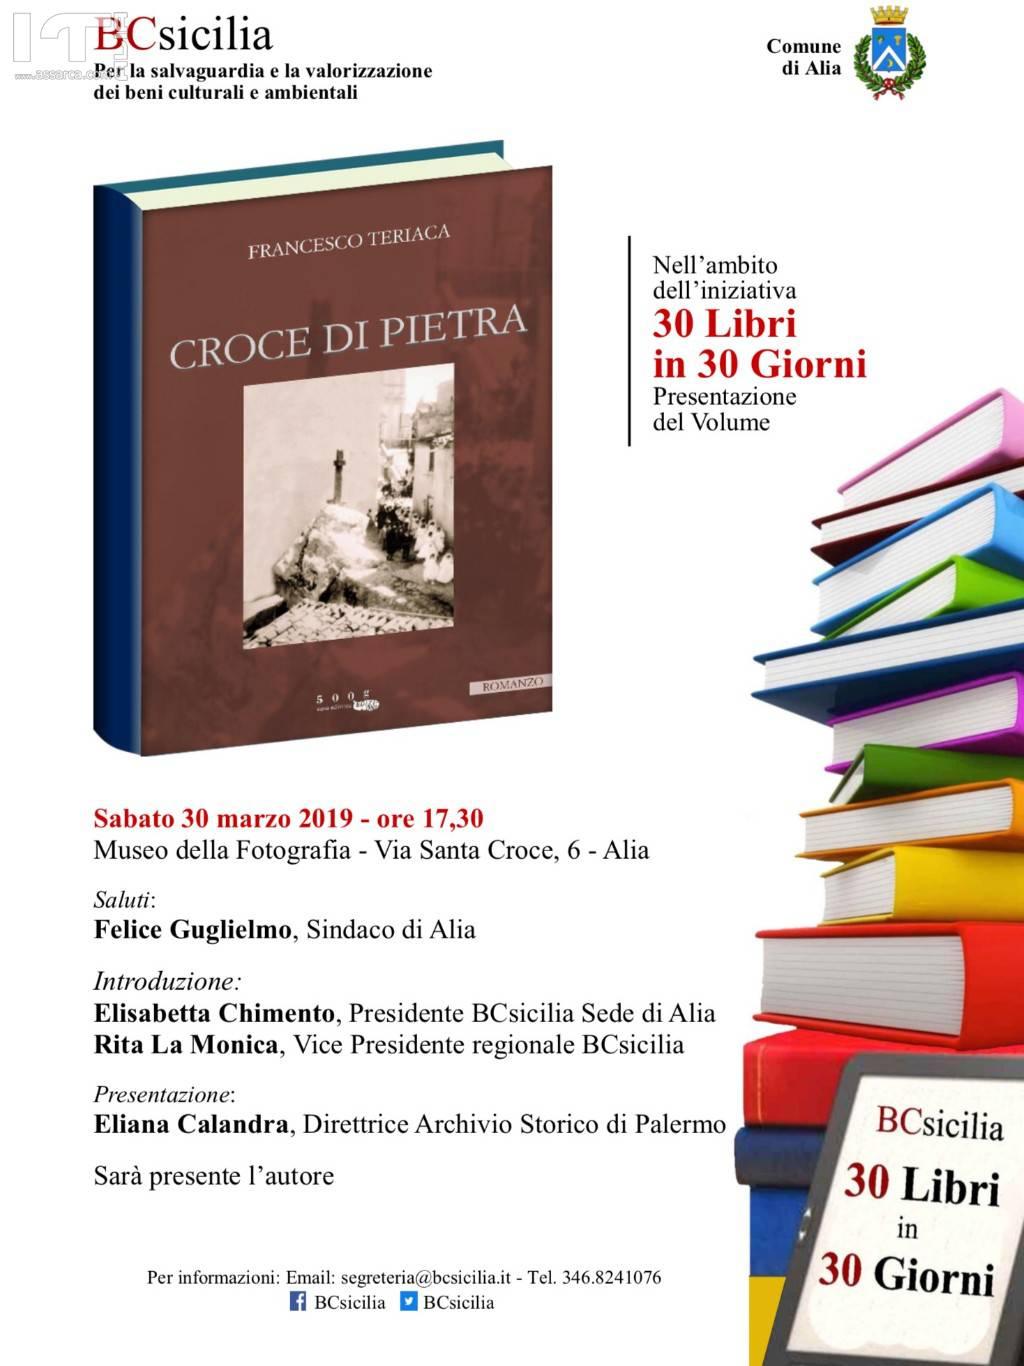 """30 GIORNI IN 30 LIBRI"" PRESENTAZIONE VOLUME DI FRANCESCO TERIACA ""CROCE DI PIETRA""."